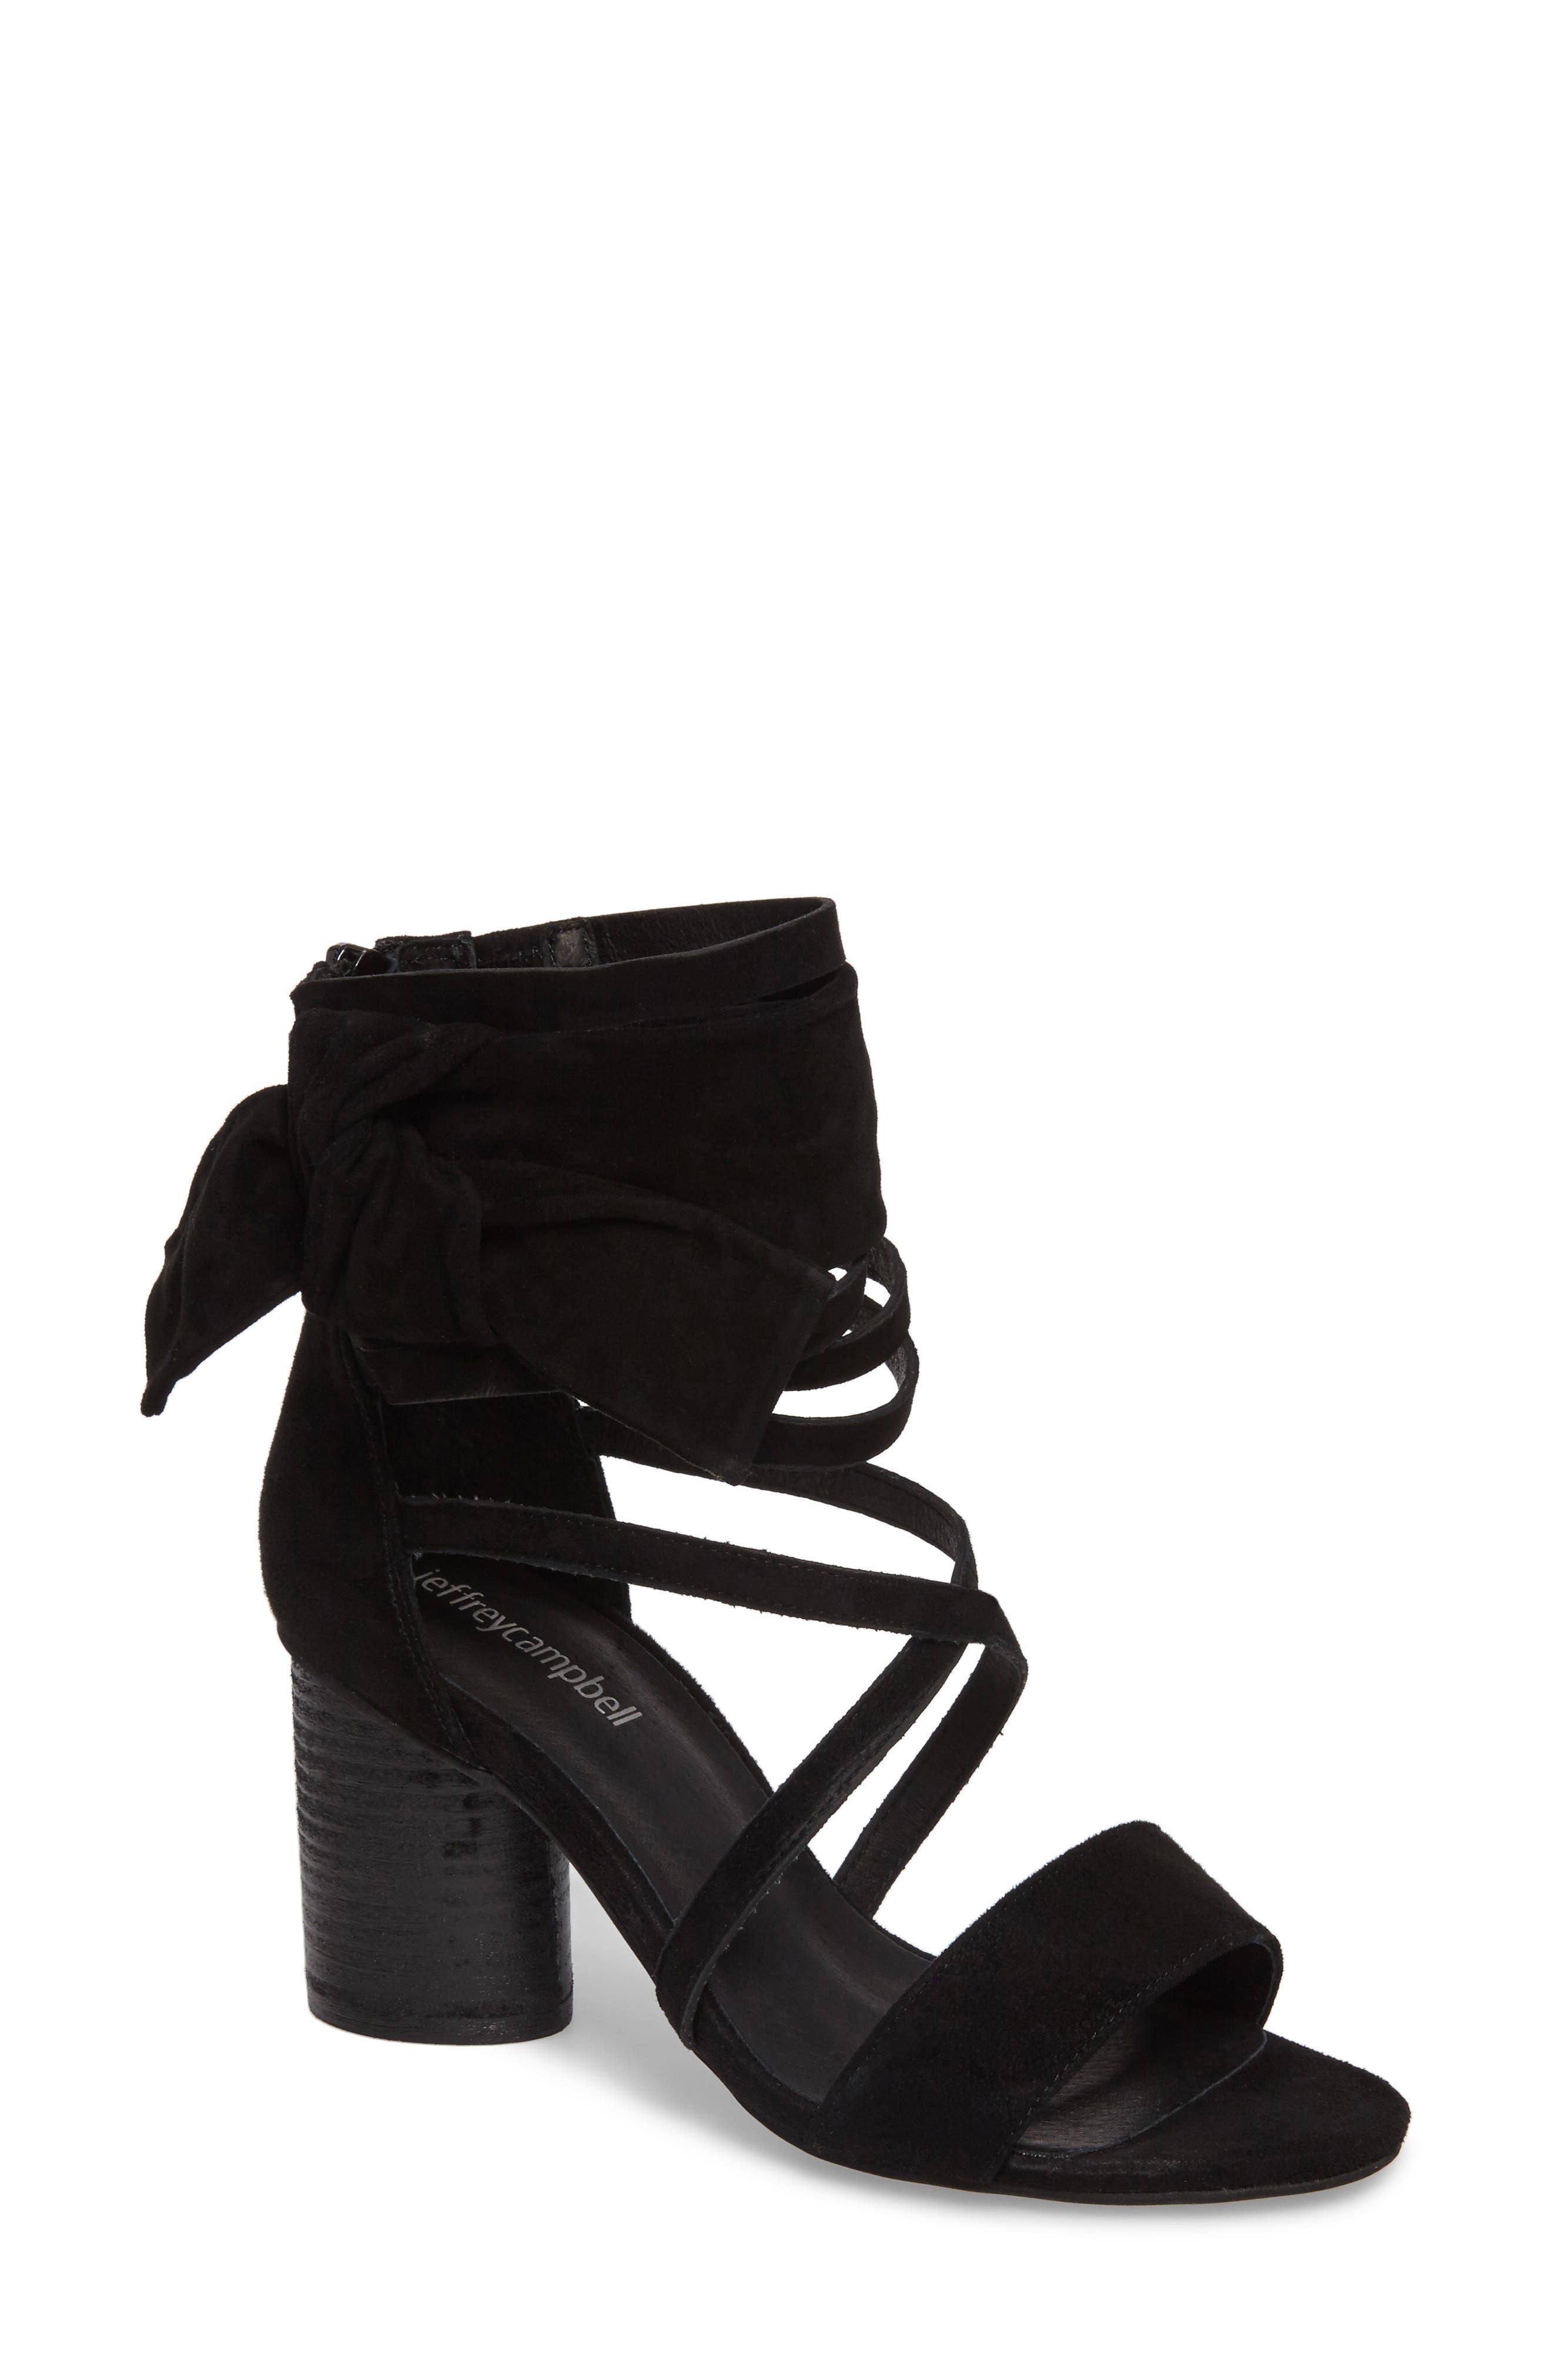 Destini Ankle Cuff Sandal,                             Main thumbnail 1, color,                             005